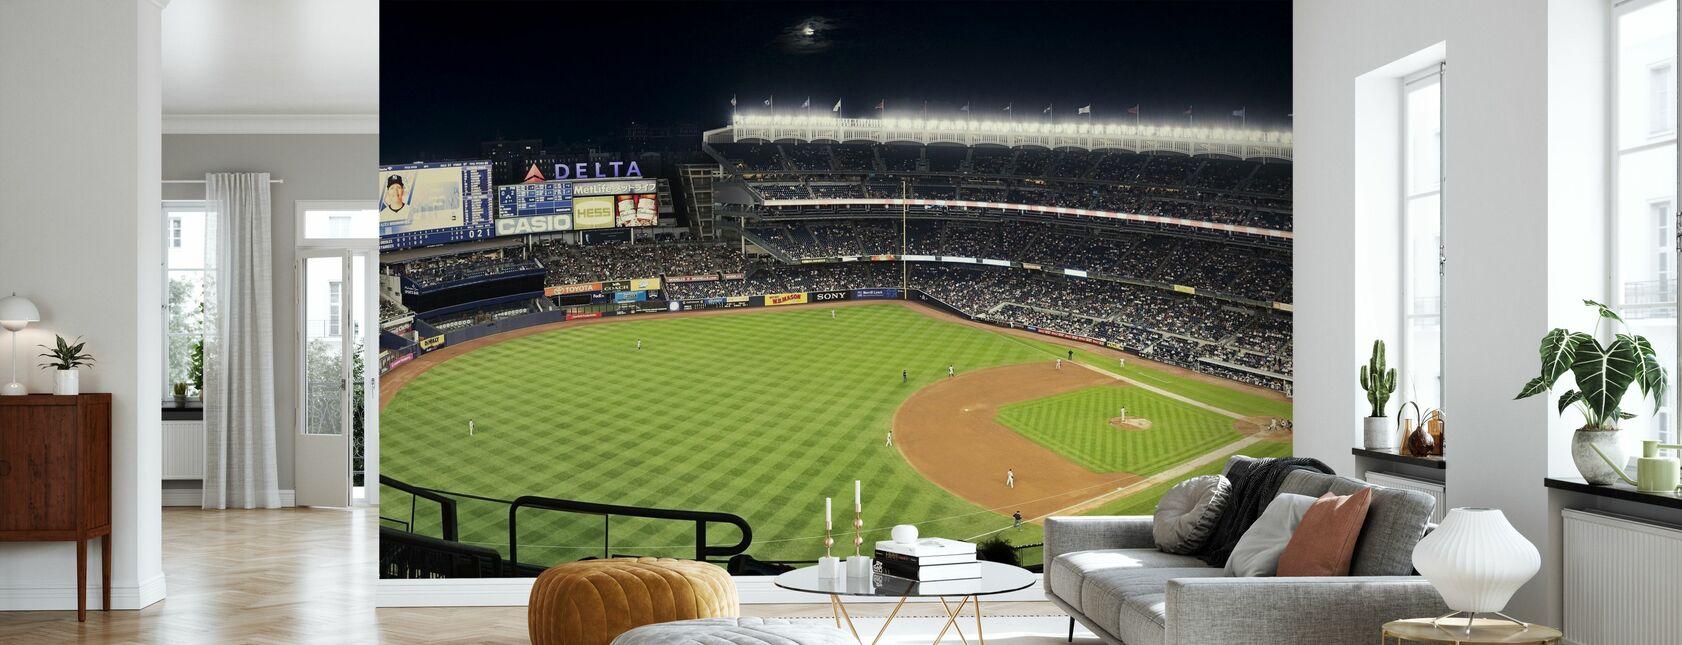 New York Yankees - Wallpaper - Living Room